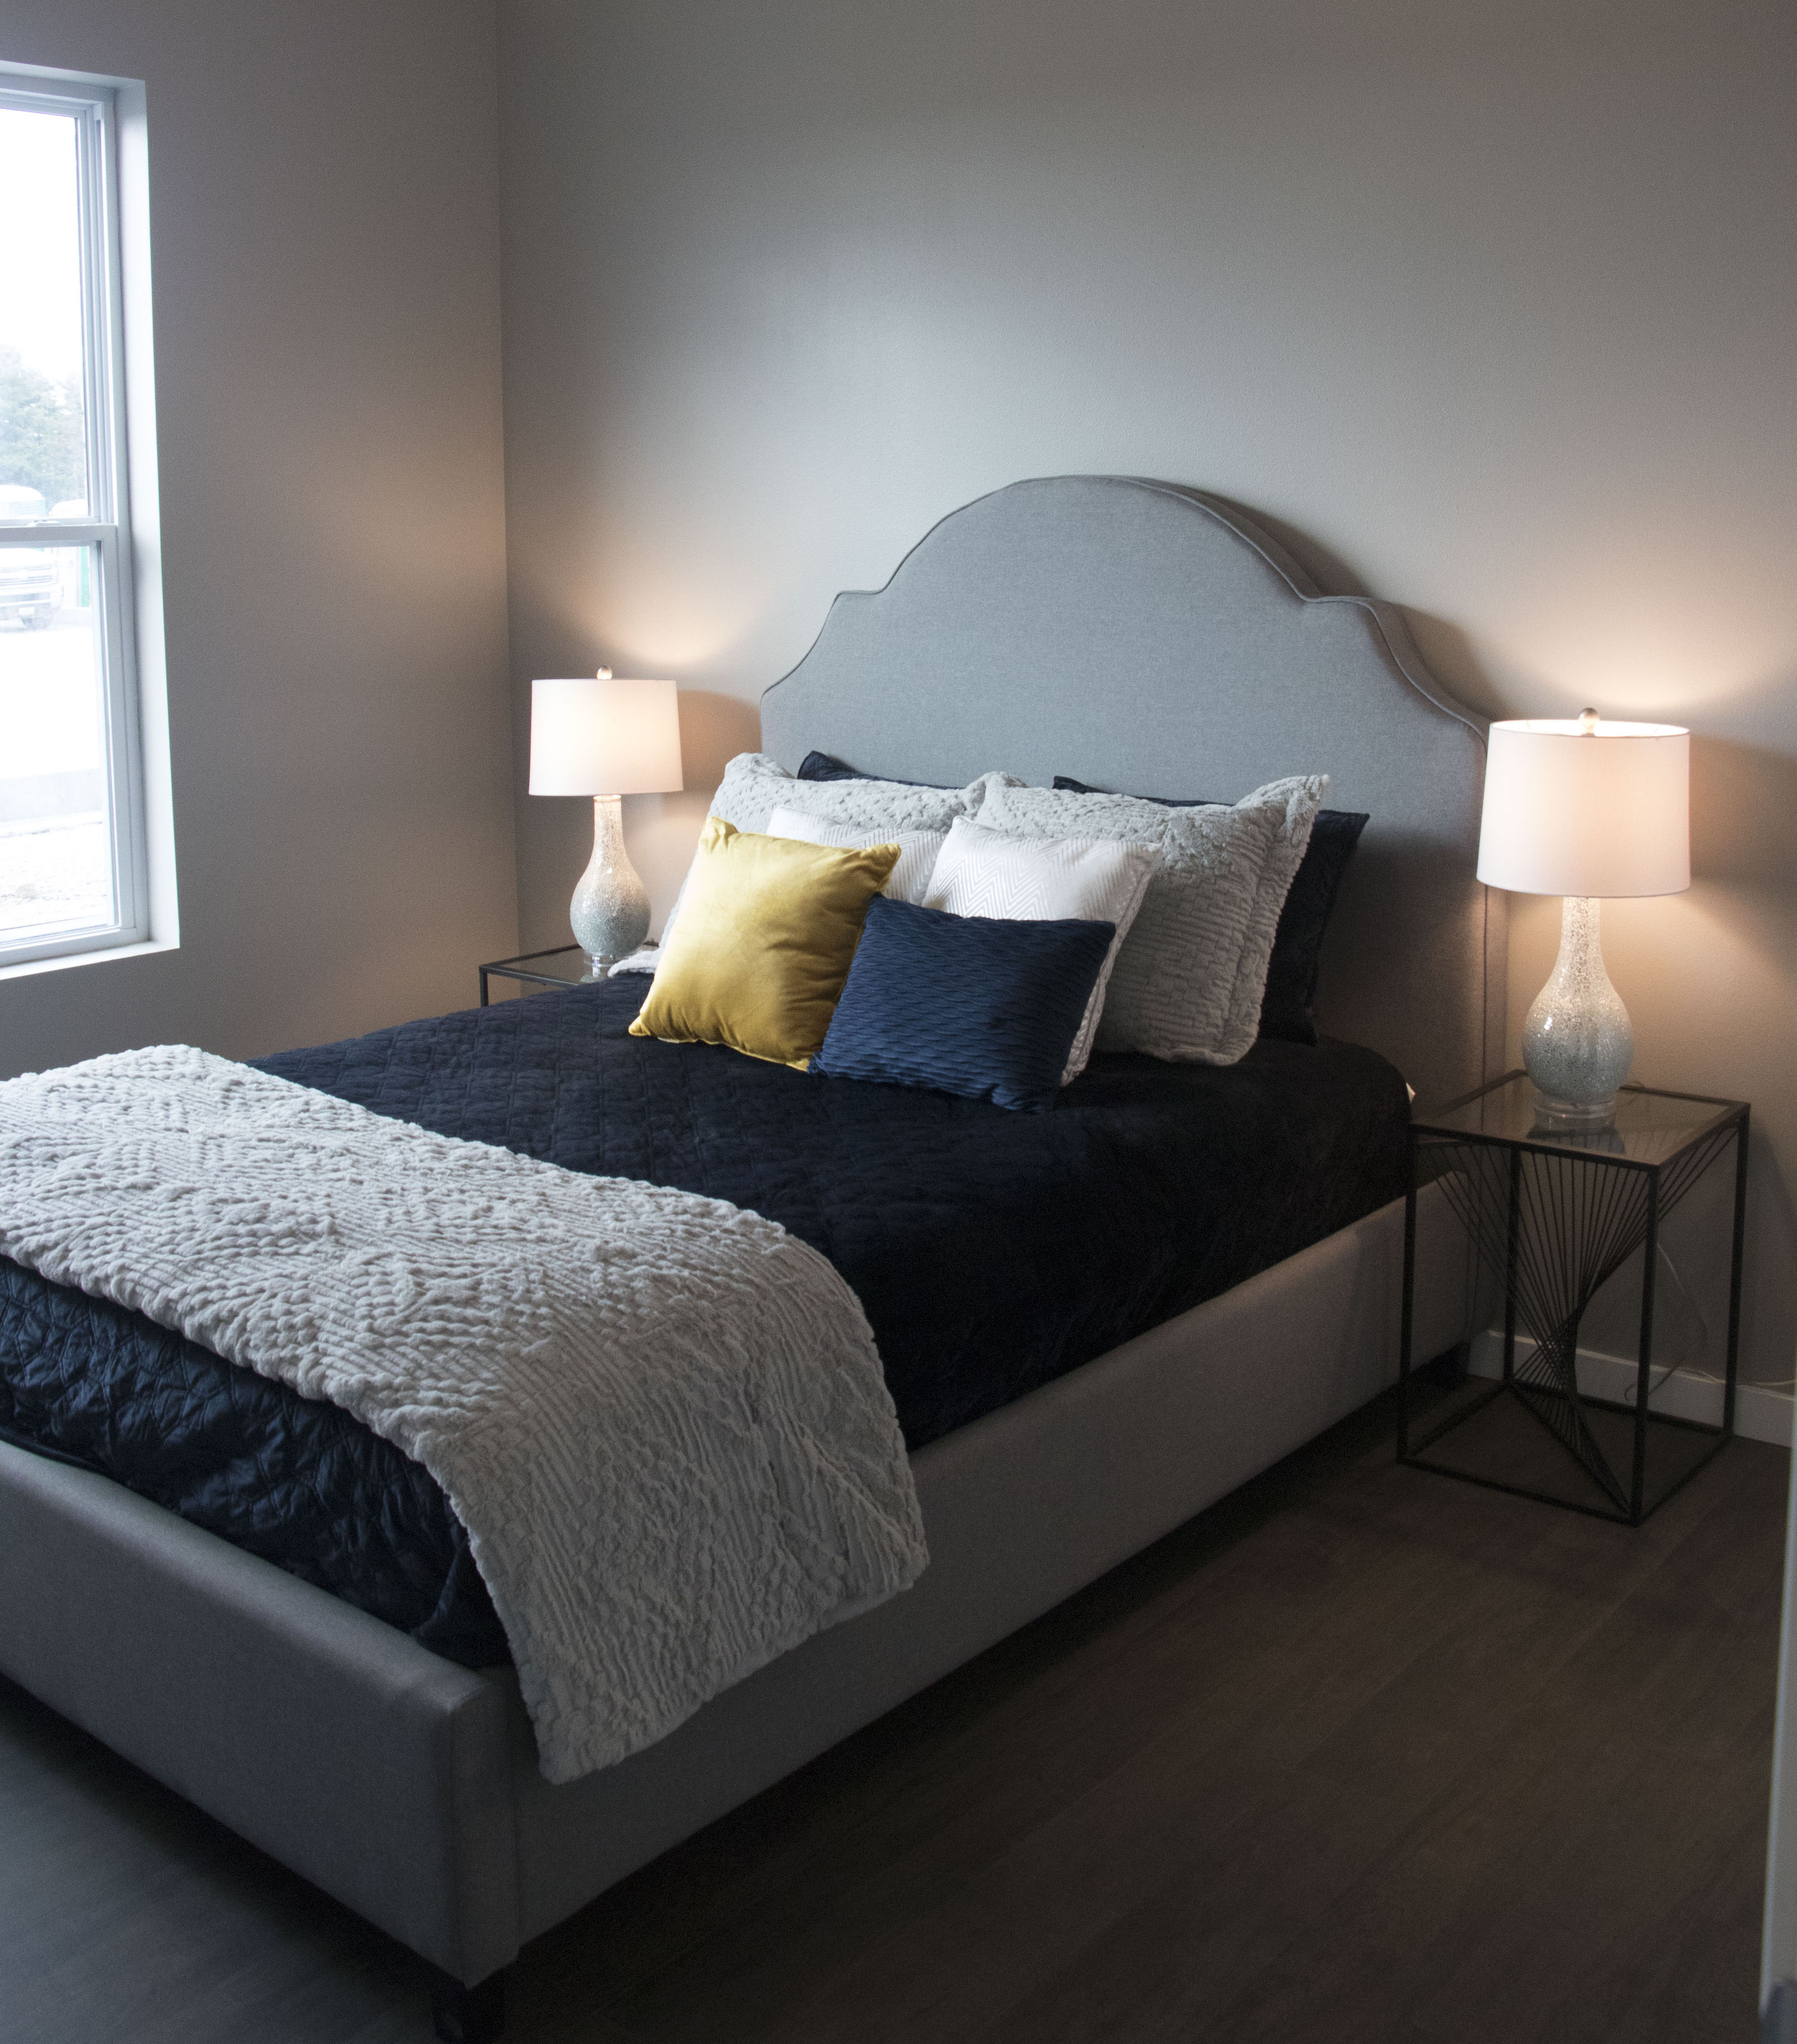 Trace Edwardsville 1 Bedroom Apartment Bedroom2